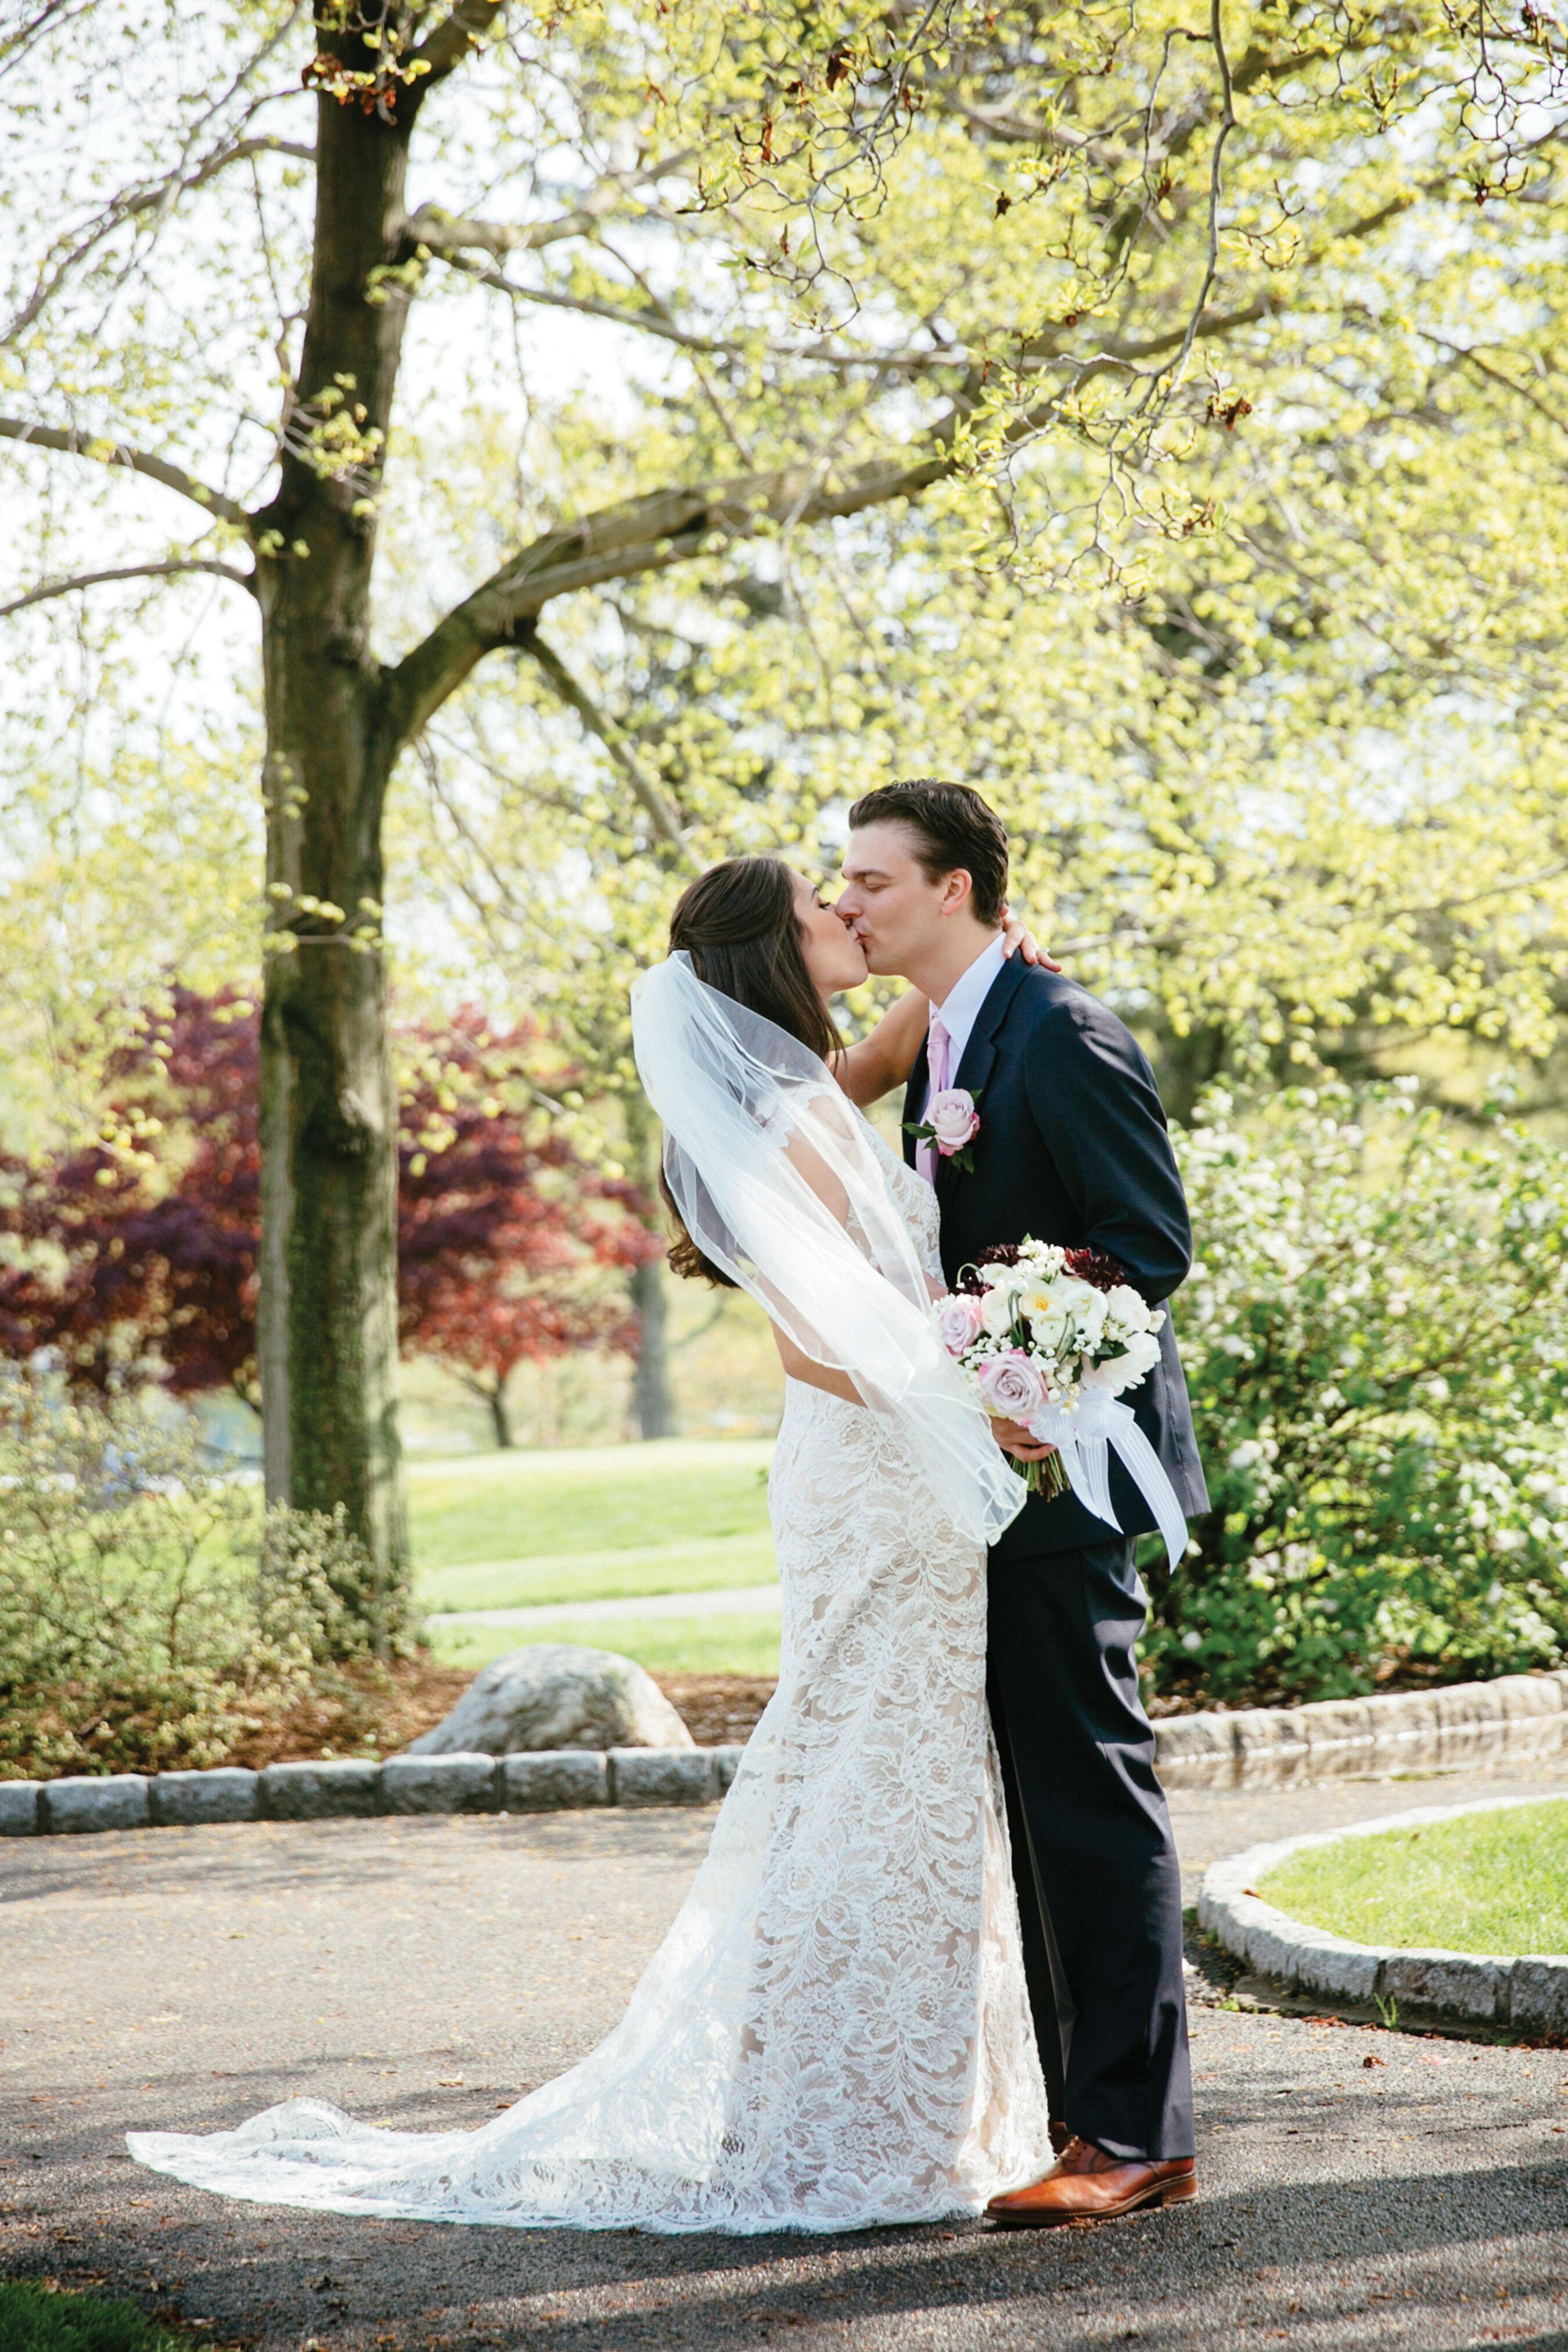 Anna Maier Ulla Maija Sheer Lace Wedding Dress